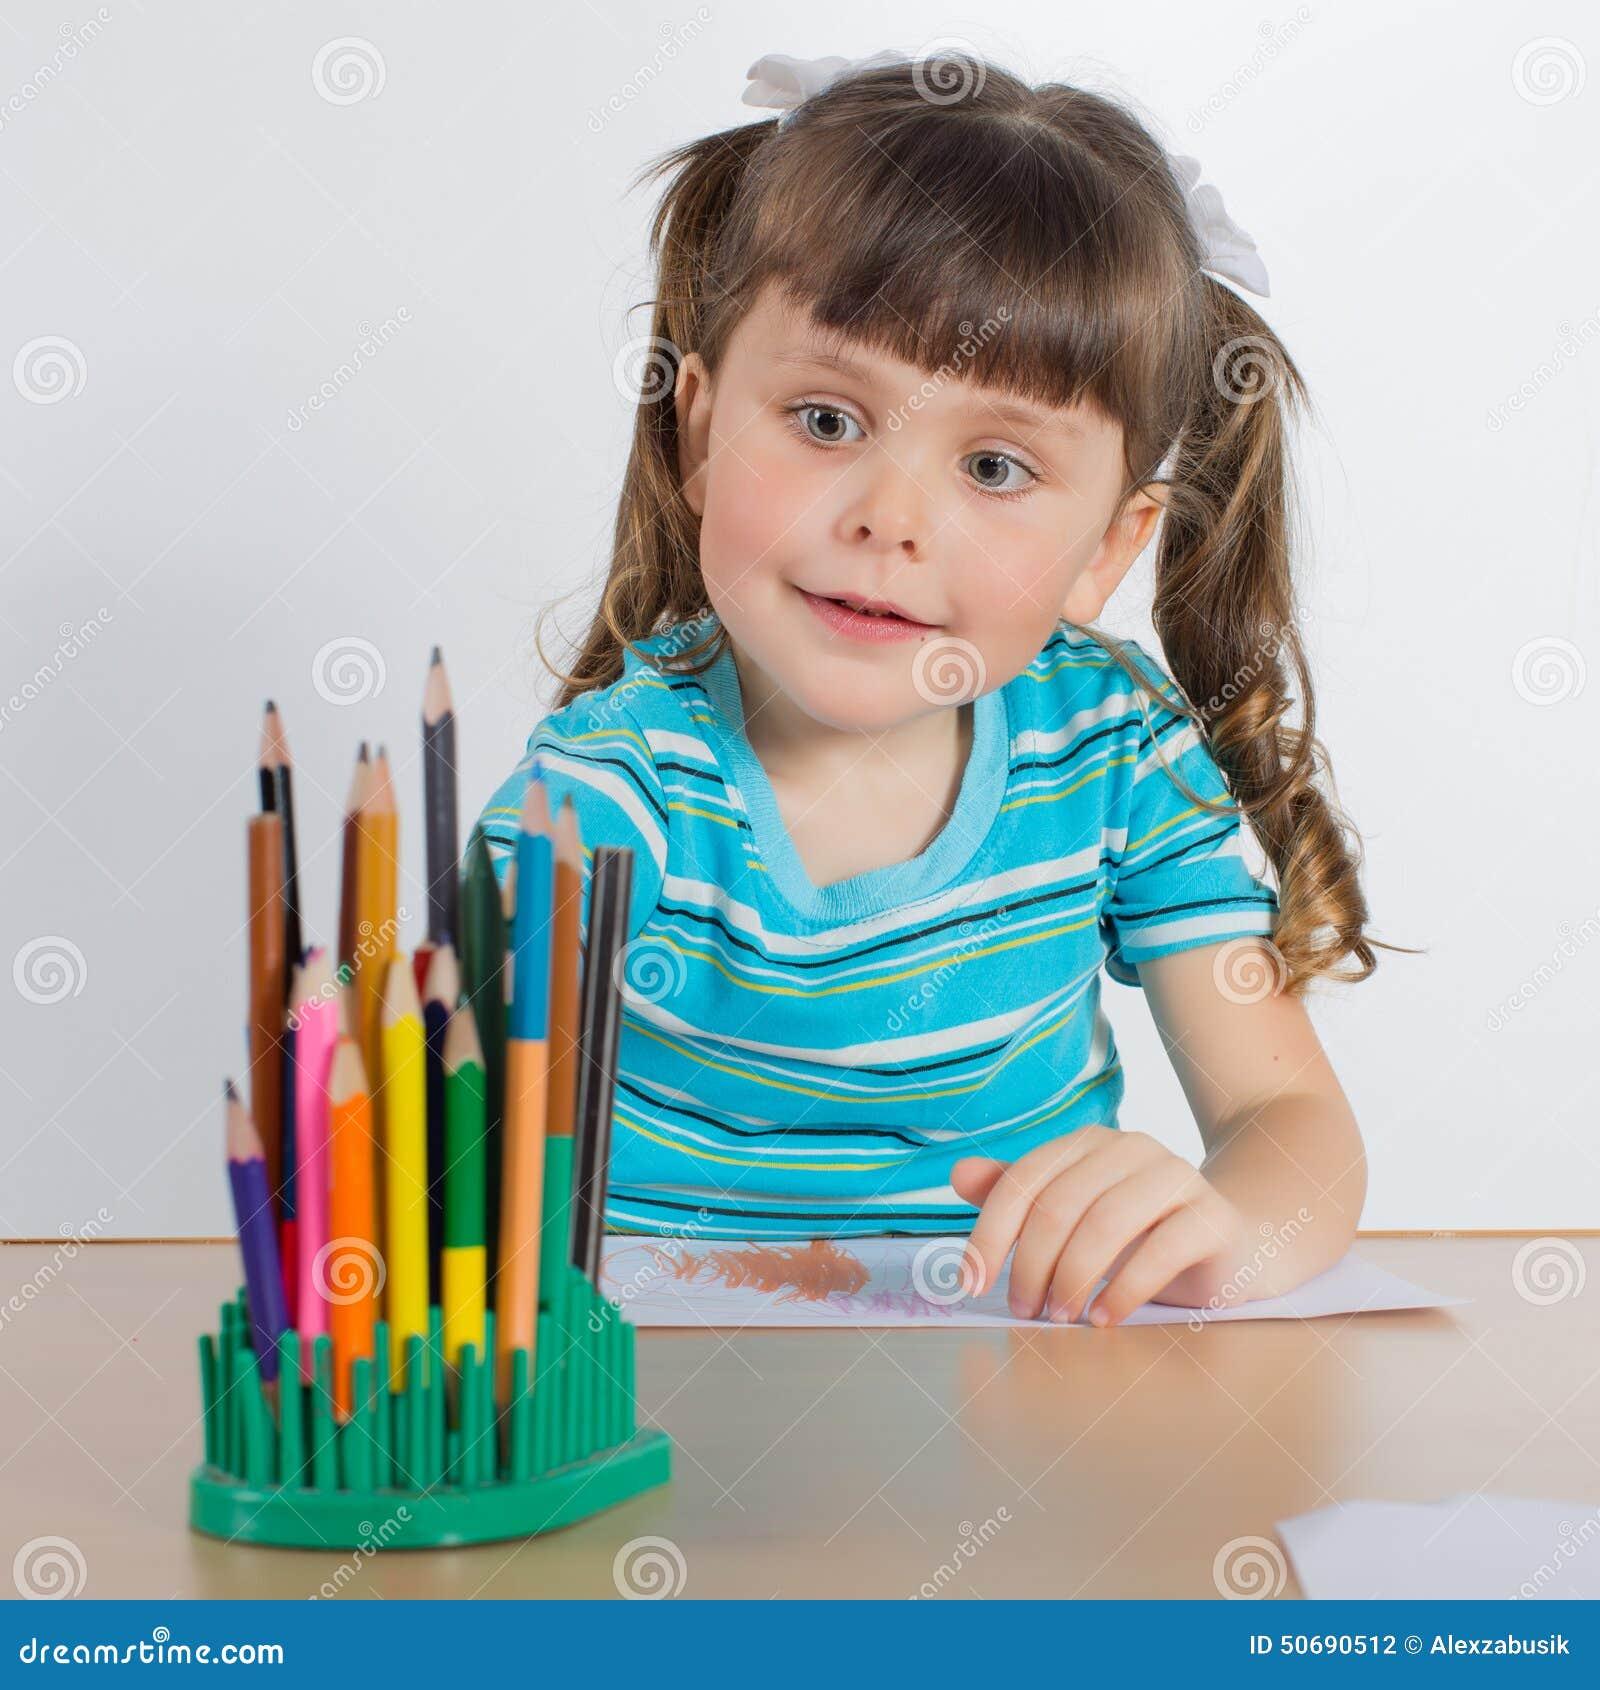 Download 少许画女孩 库存照片. 图片 包括有 户内, 图象, 国内, 生活方式, 童年, 子项, 服务台, 上色 - 50690512